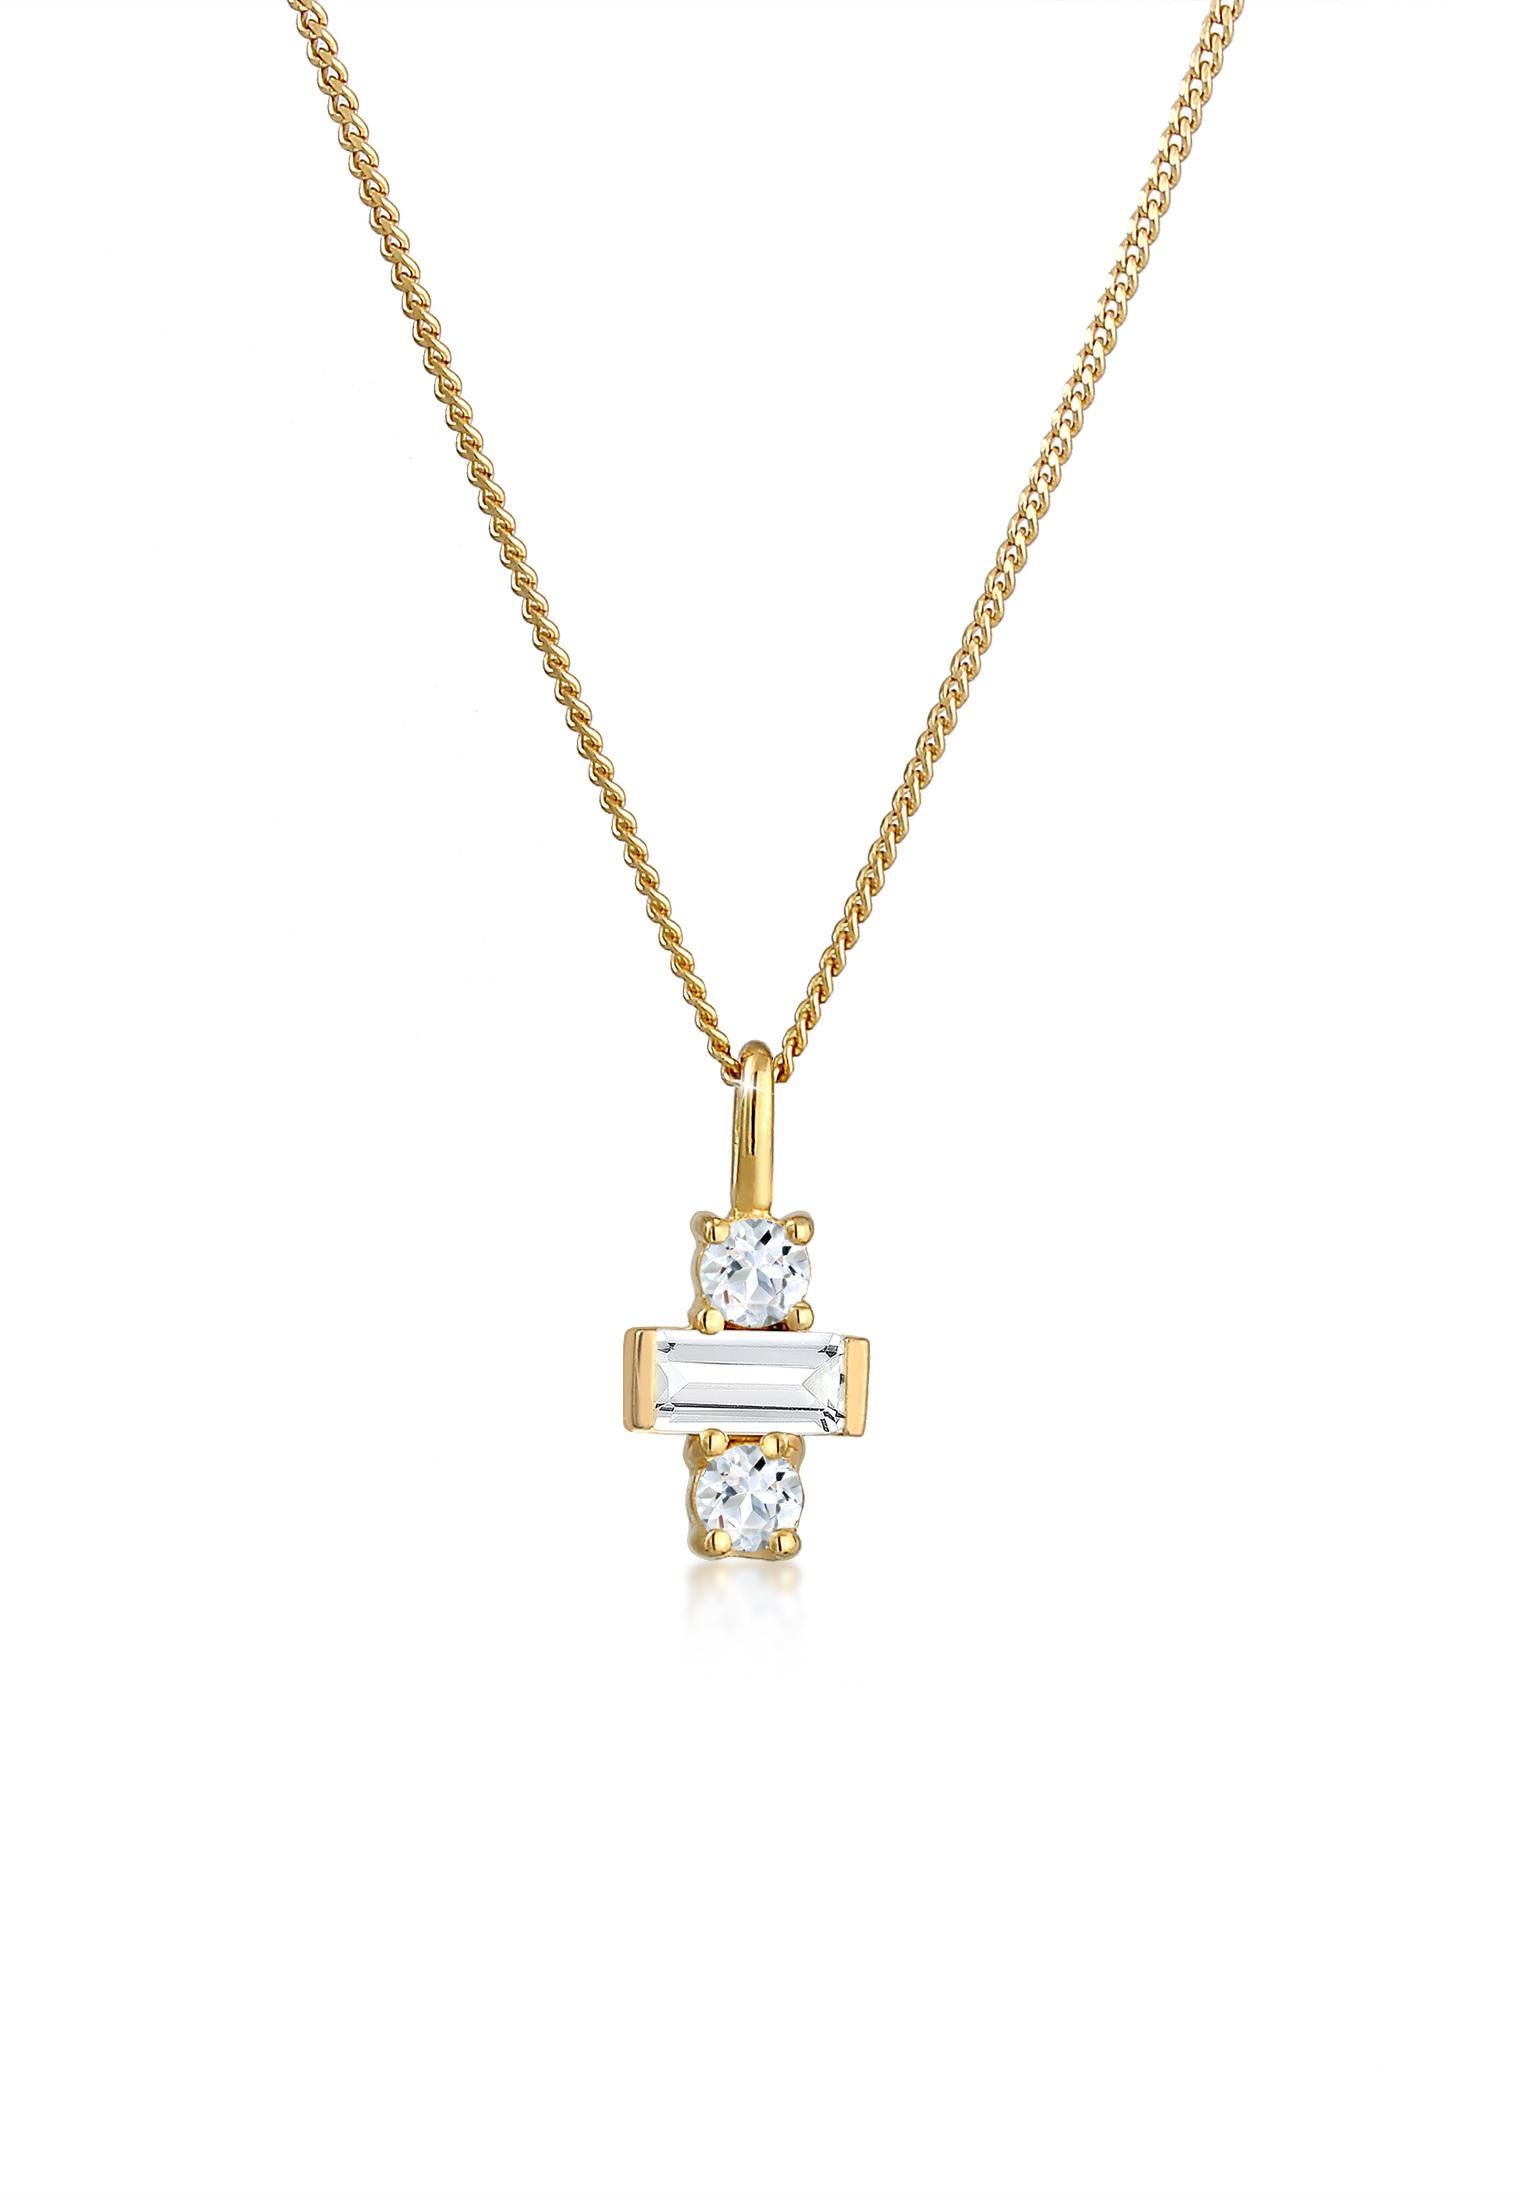 Halskette | Topas ( Weiß ) | 925 Sterling Silber vergoldet